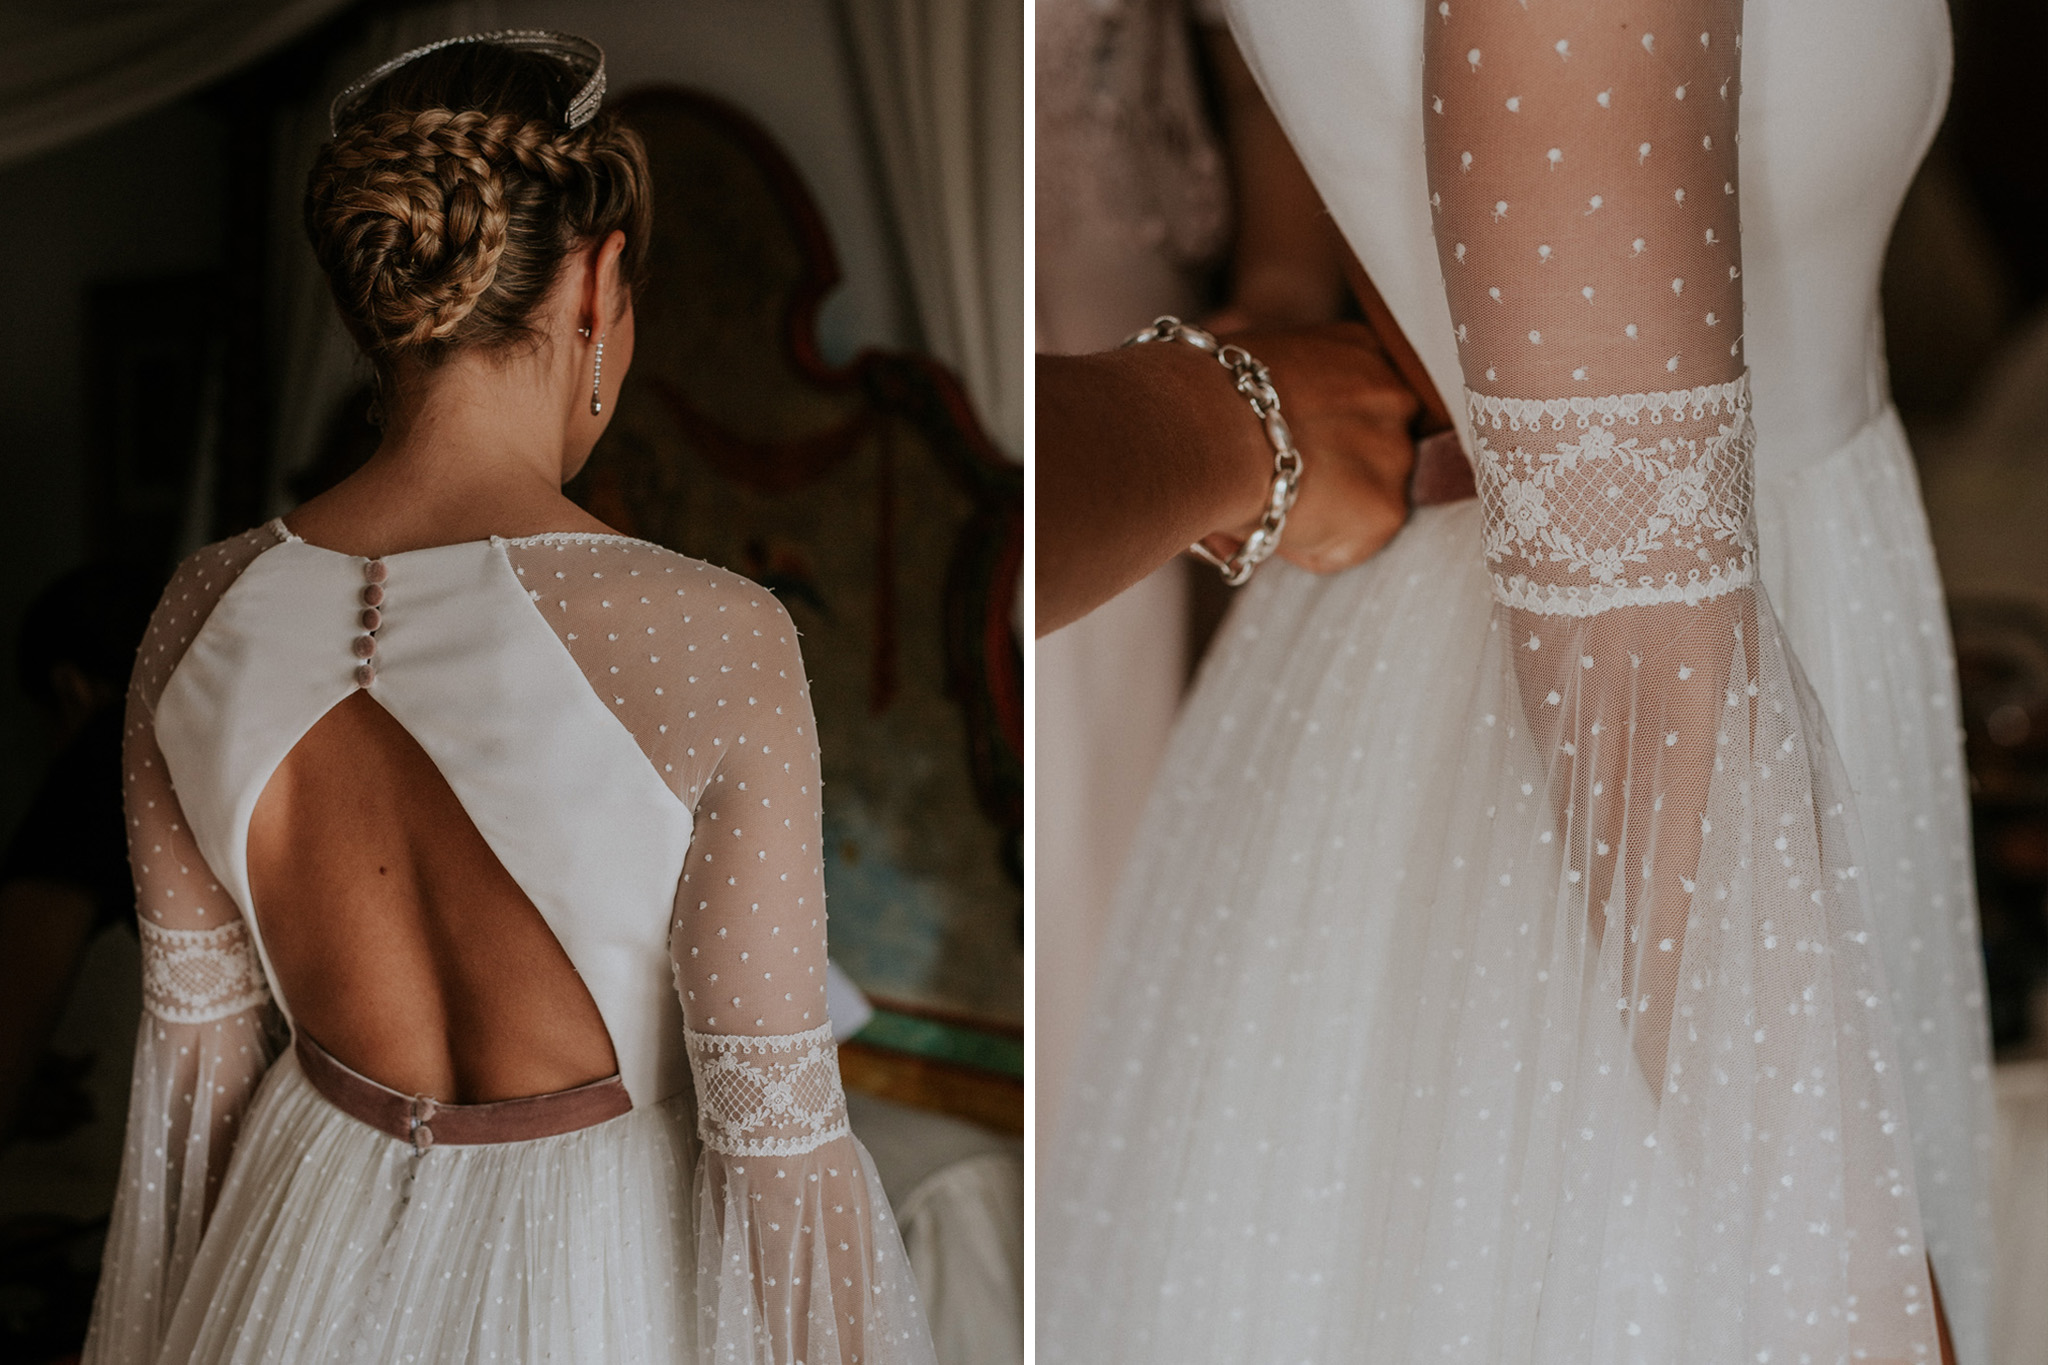 fotografia-boda-wedding-photographer-spain-concorazon-63